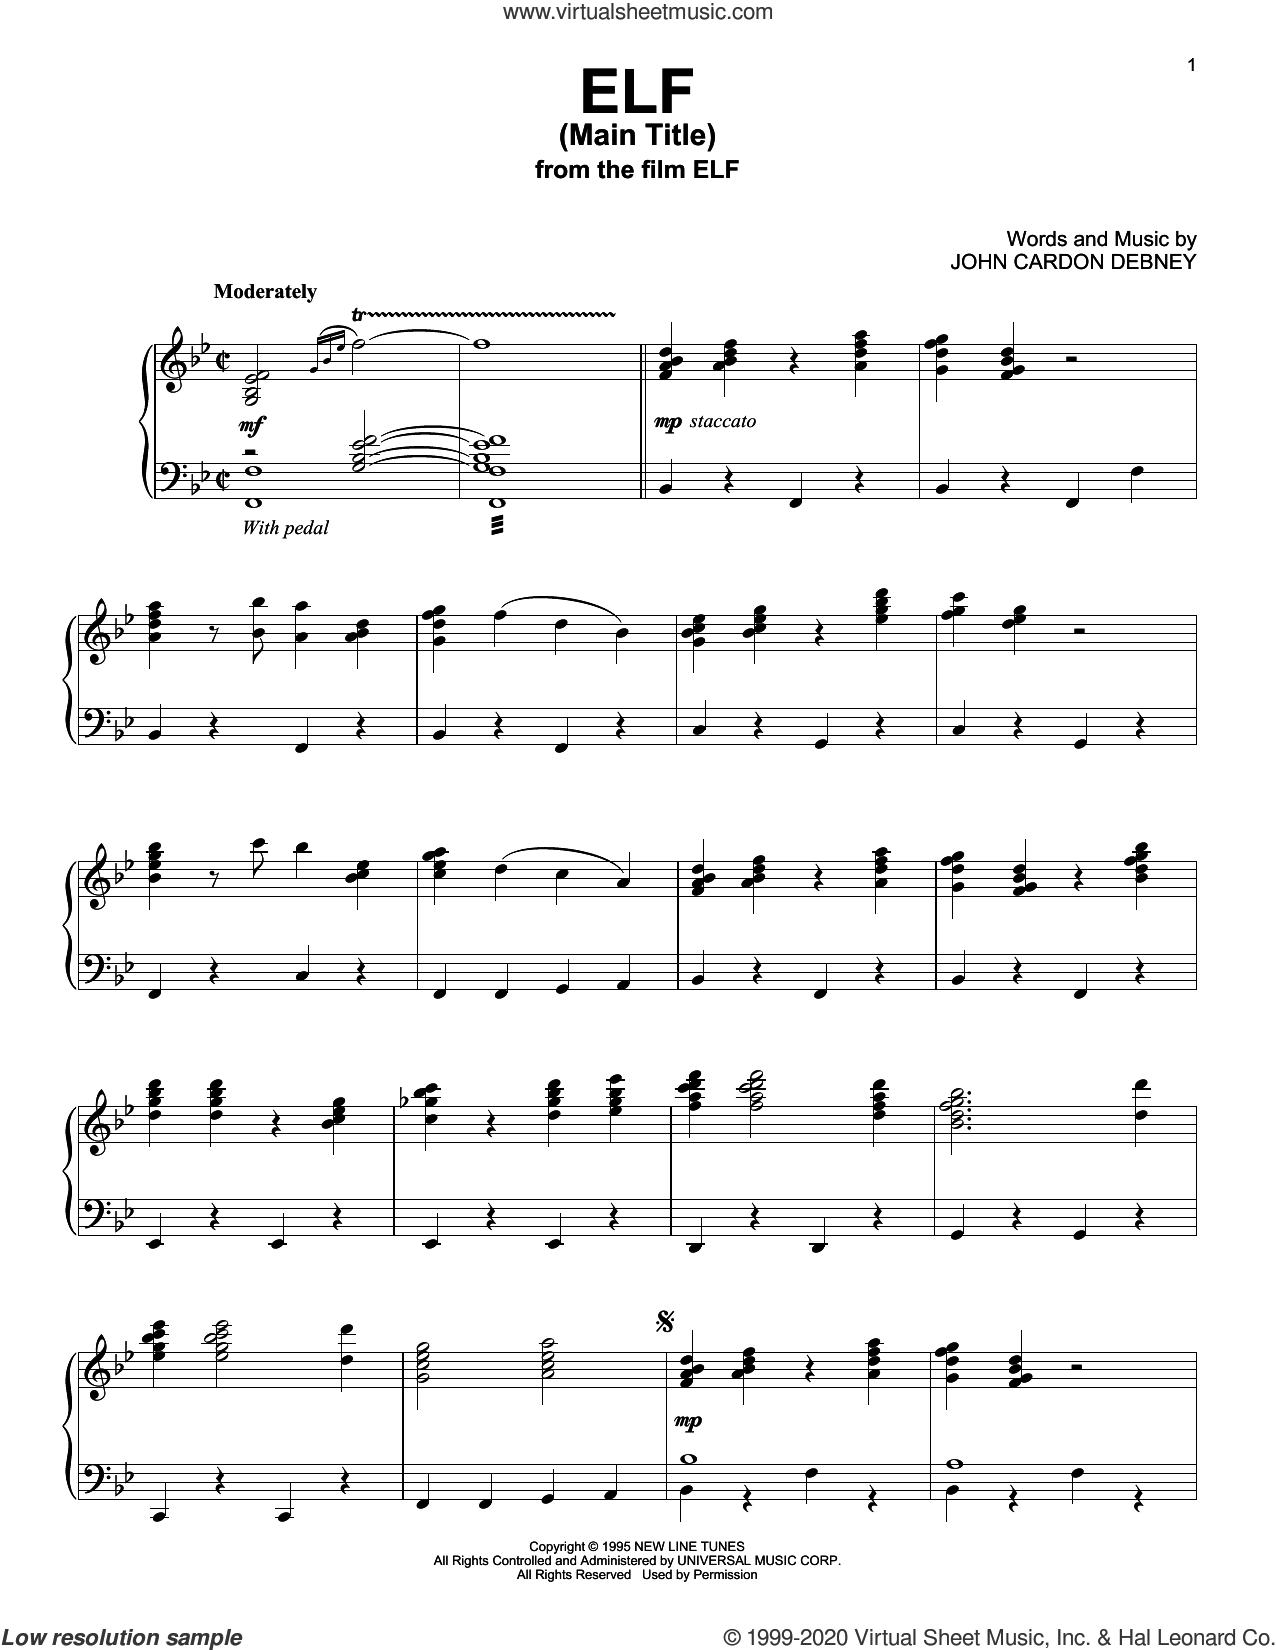 Elf (Main Title) sheet music for piano solo by John Cardon Debney, intermediate skill level